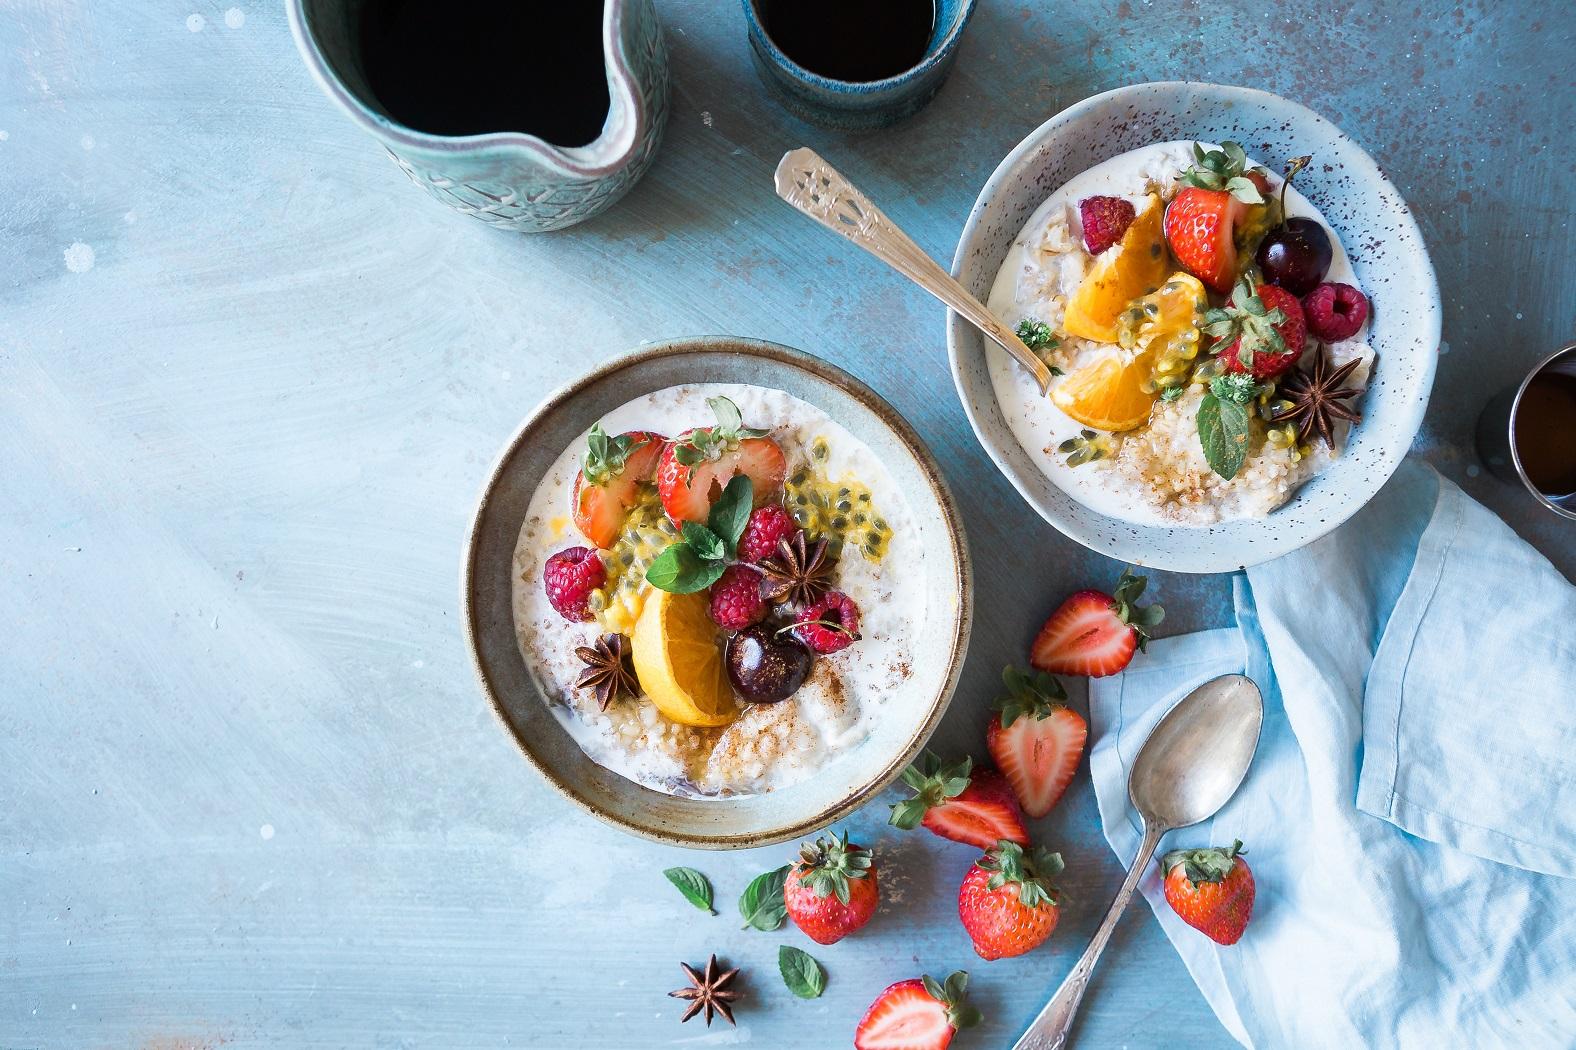 Oatmeal Recipes|HarassedMom